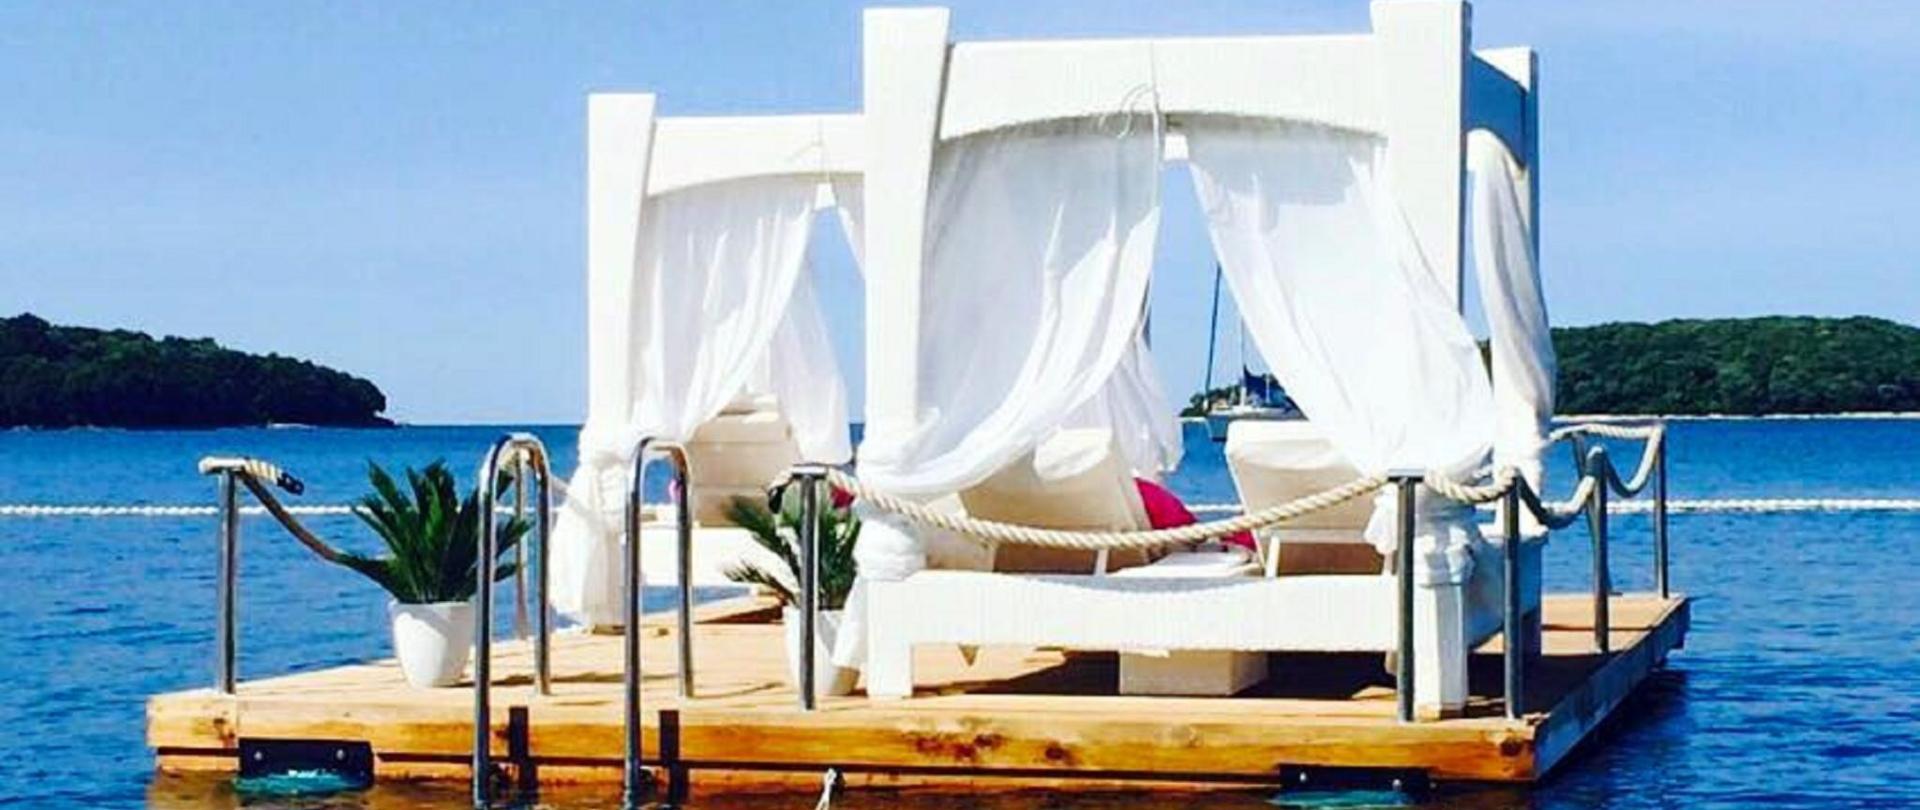 Funtana_BeachPolidor (4).jpg